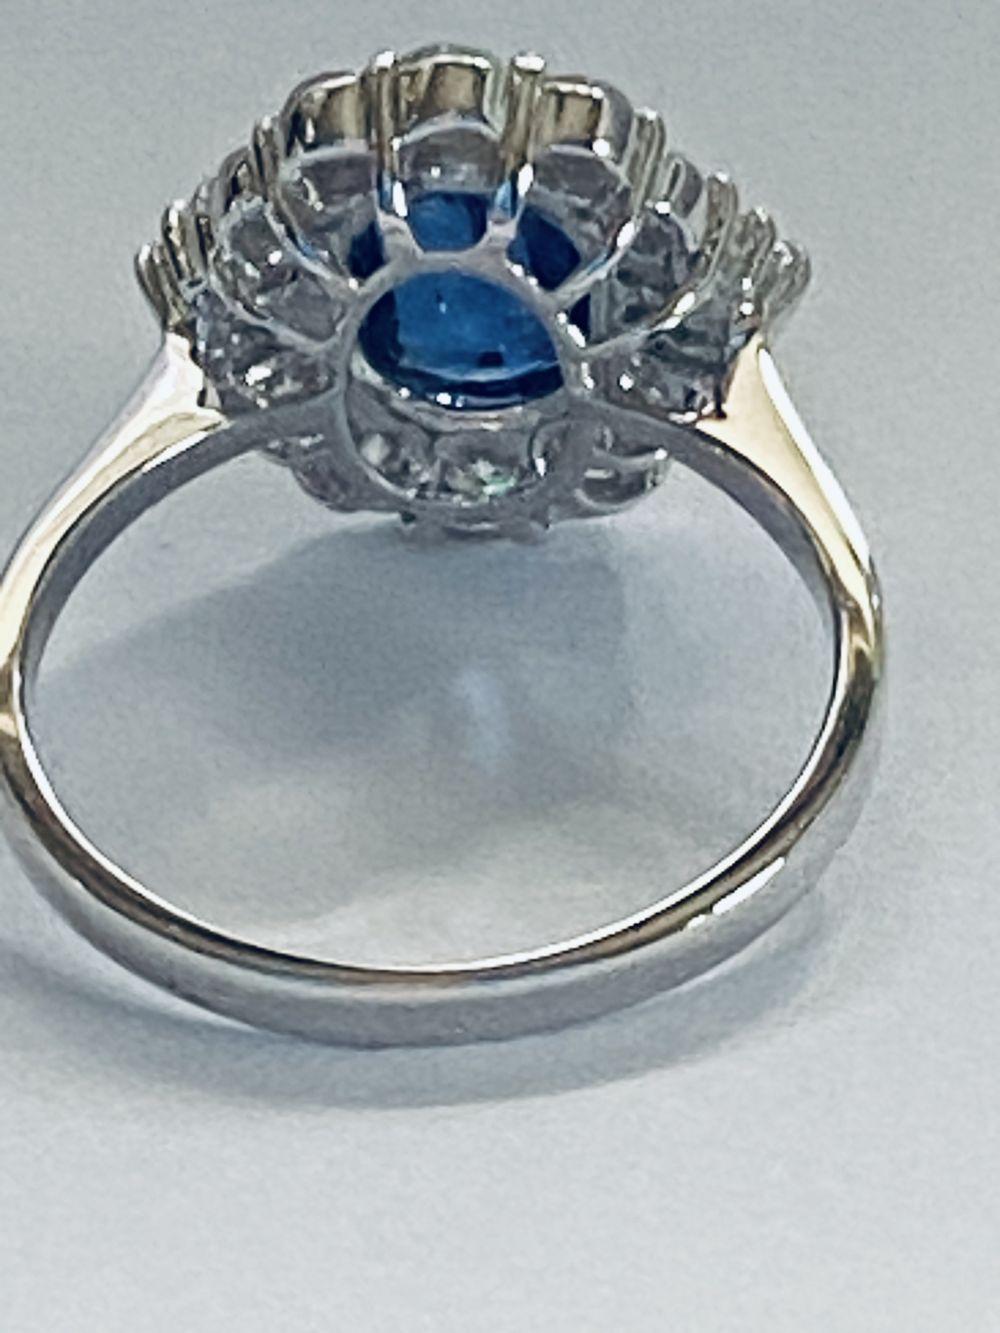 ART DECO DIAMOND AND CEYLON SAPPHIRE CLUSTER RING - Image 7 of 7